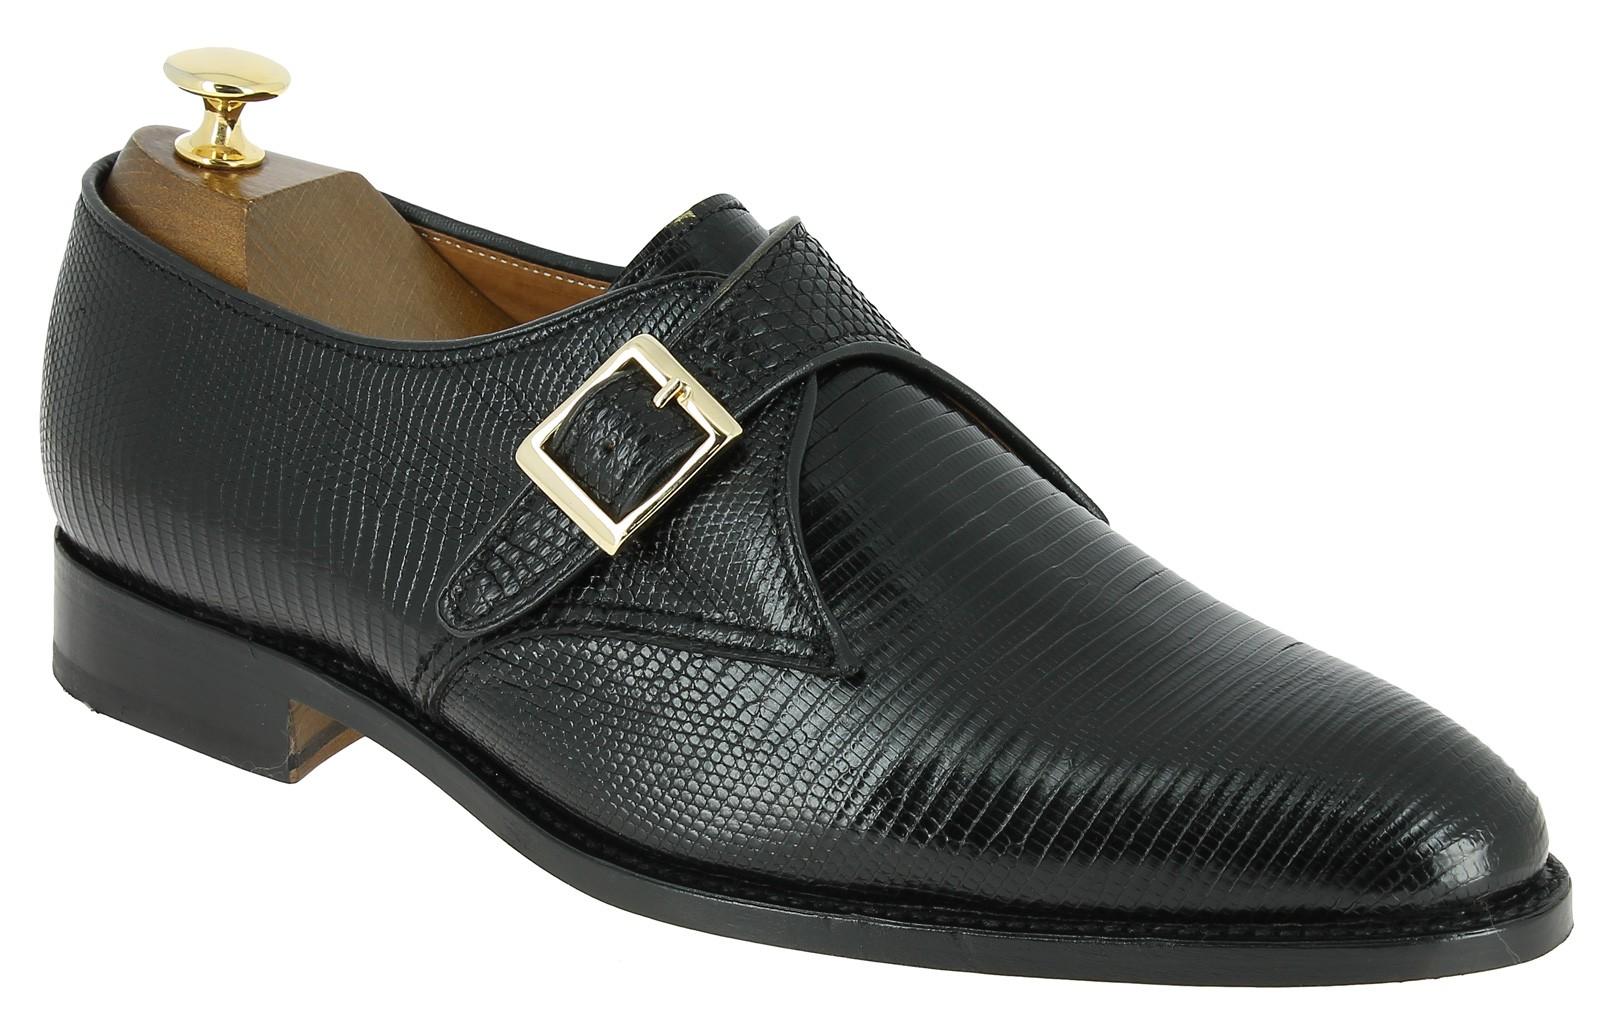 chaussure boucle john mendson 11168 v ritable l zard noir center 51. Black Bedroom Furniture Sets. Home Design Ideas